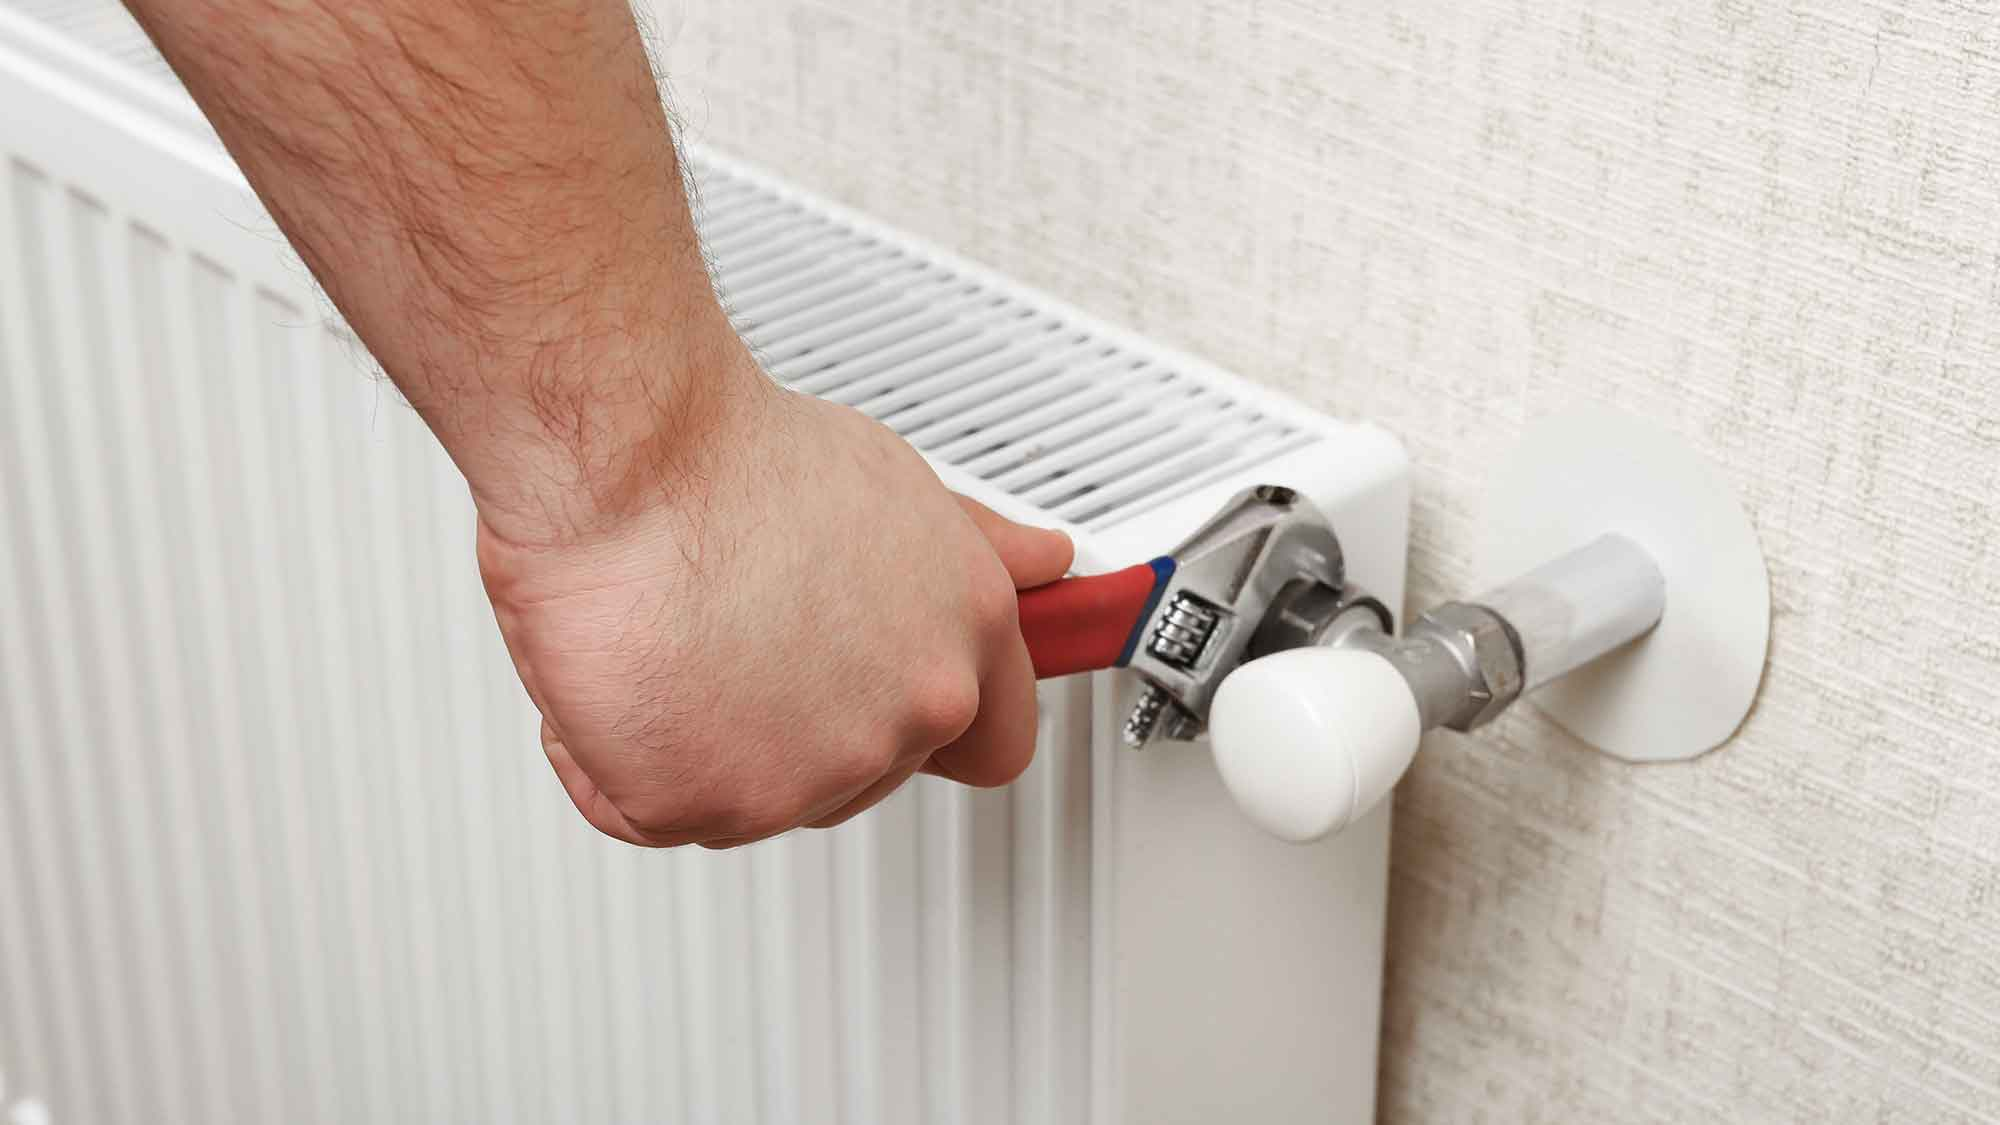 radiator service essex maintenance leigh on sea fix